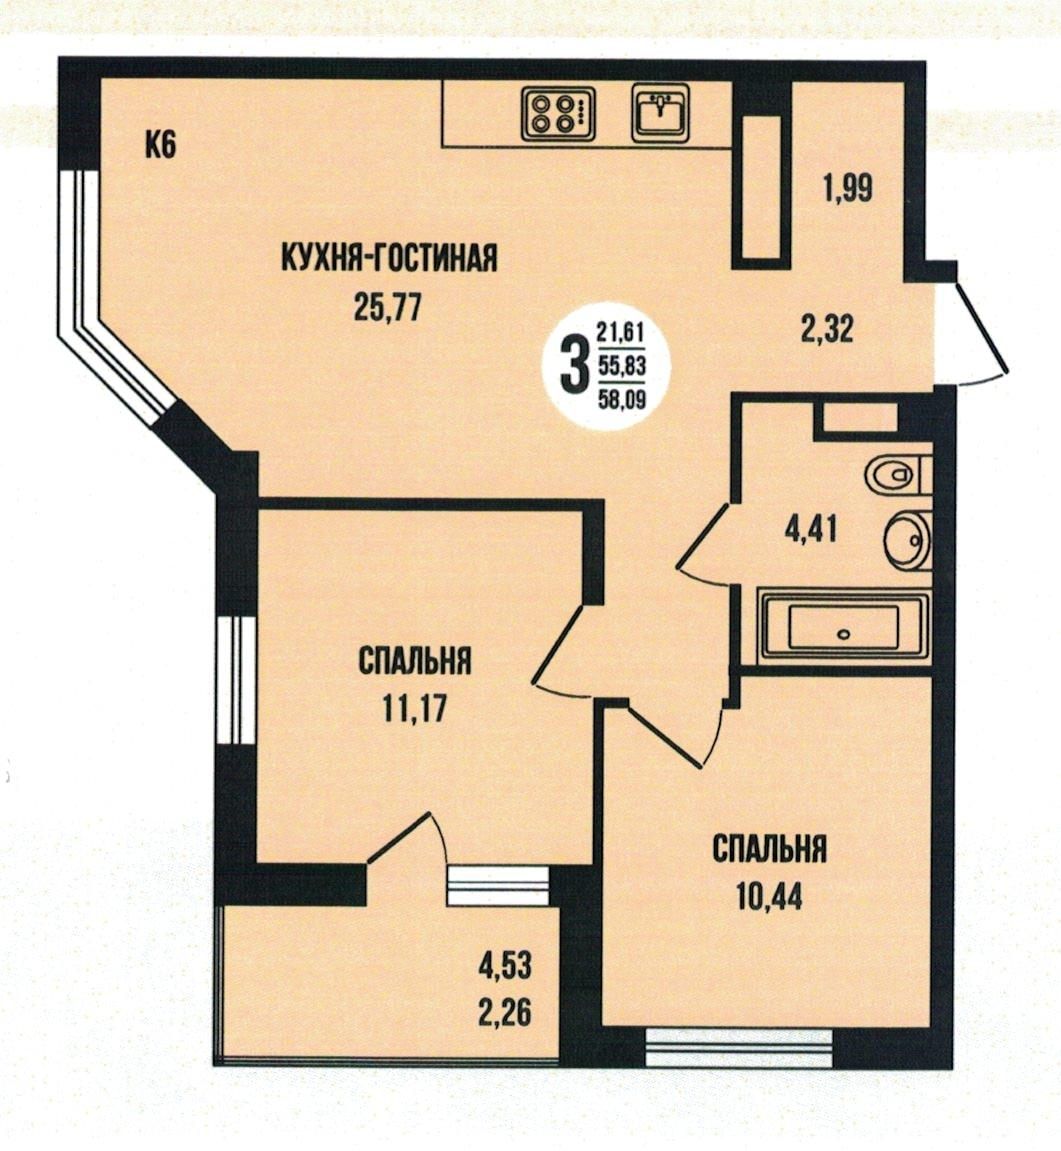 3-комнатная квартира с евро планировкой  58.09 м²